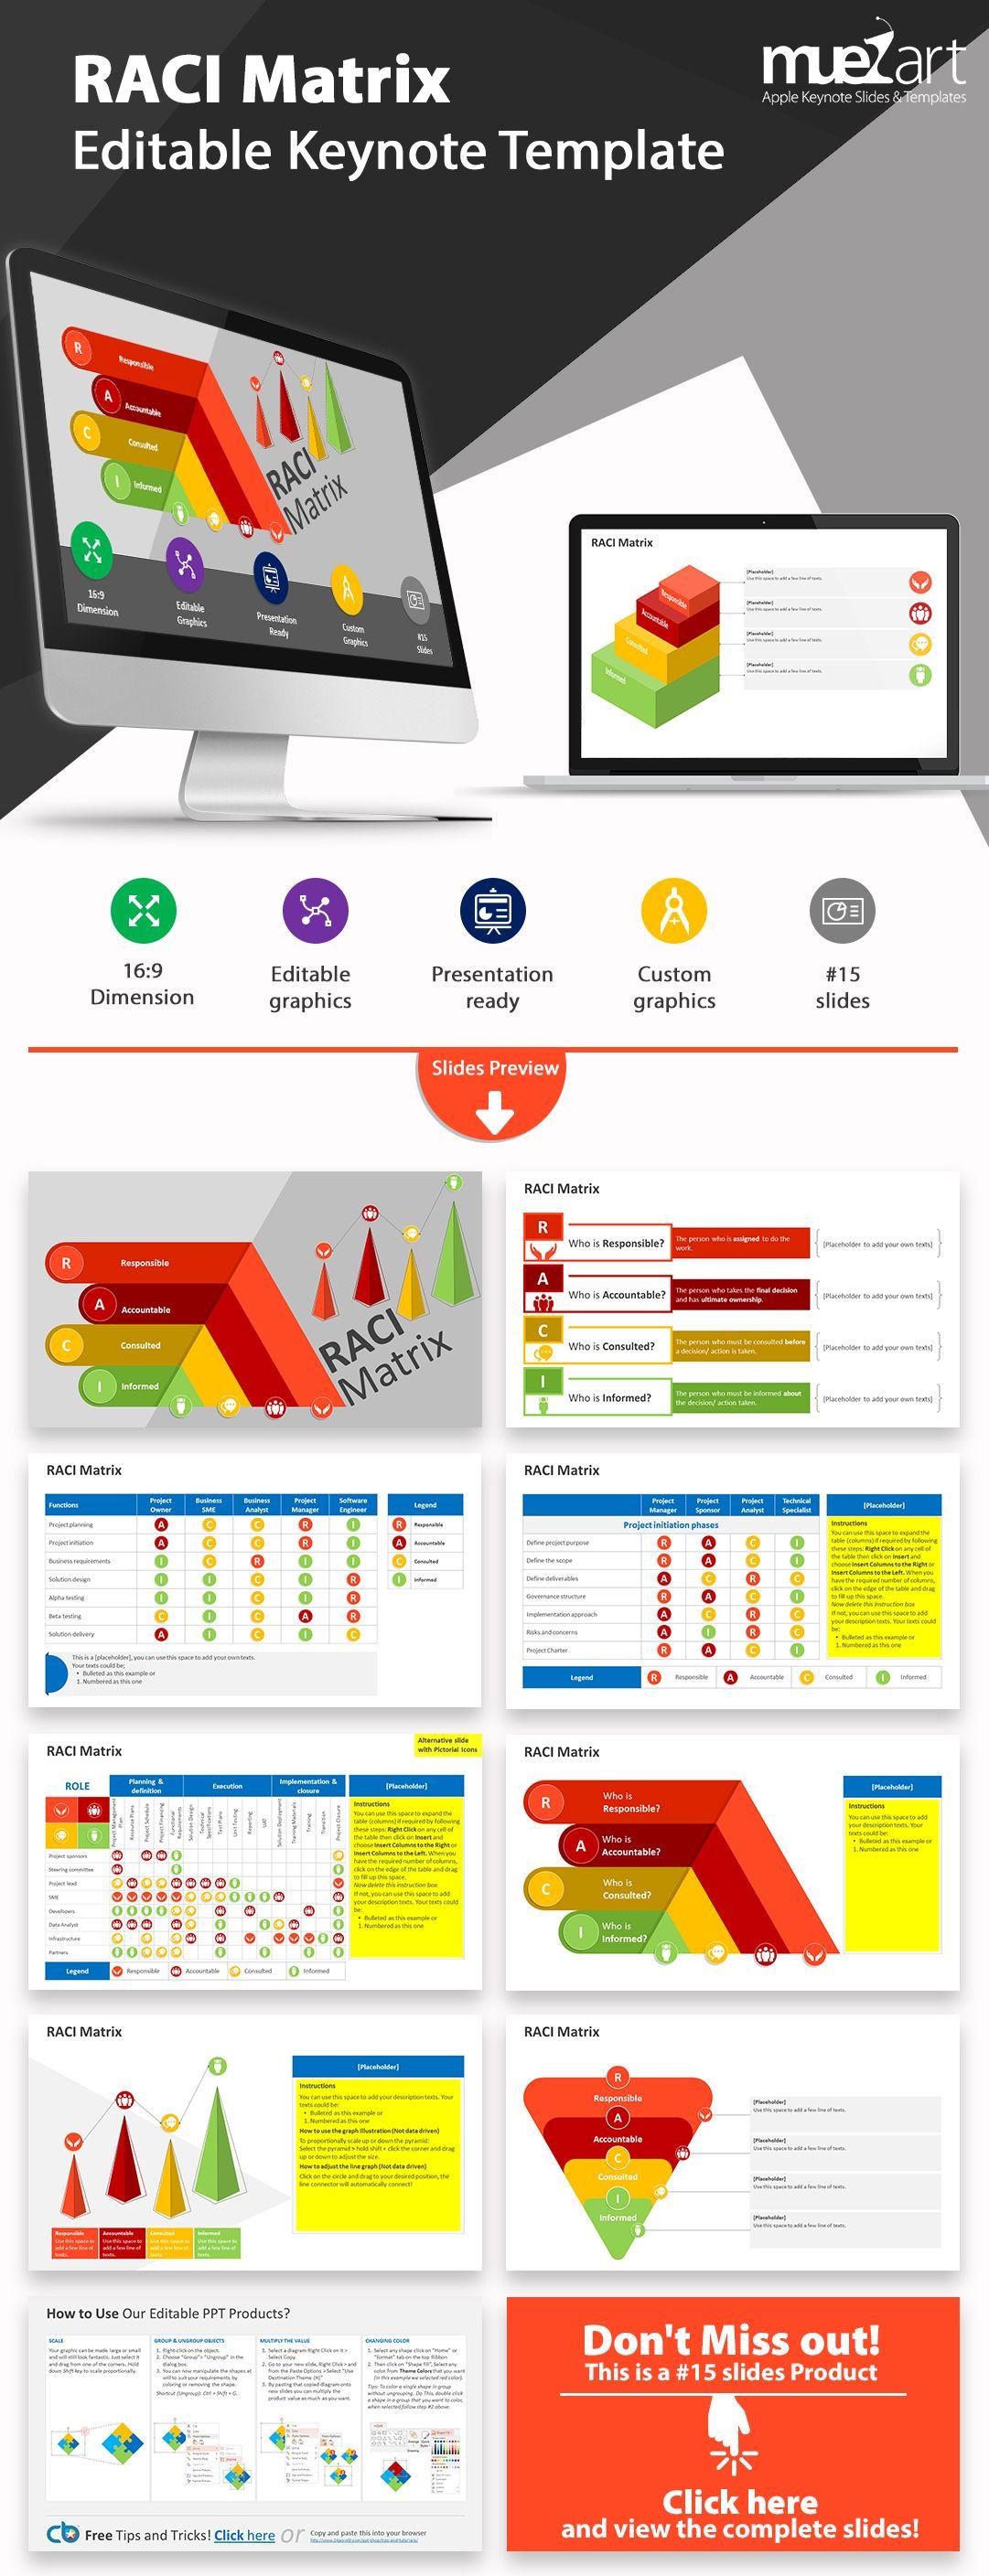 Raci Matrix Model Editable Keynote Template Pmp Pinterest